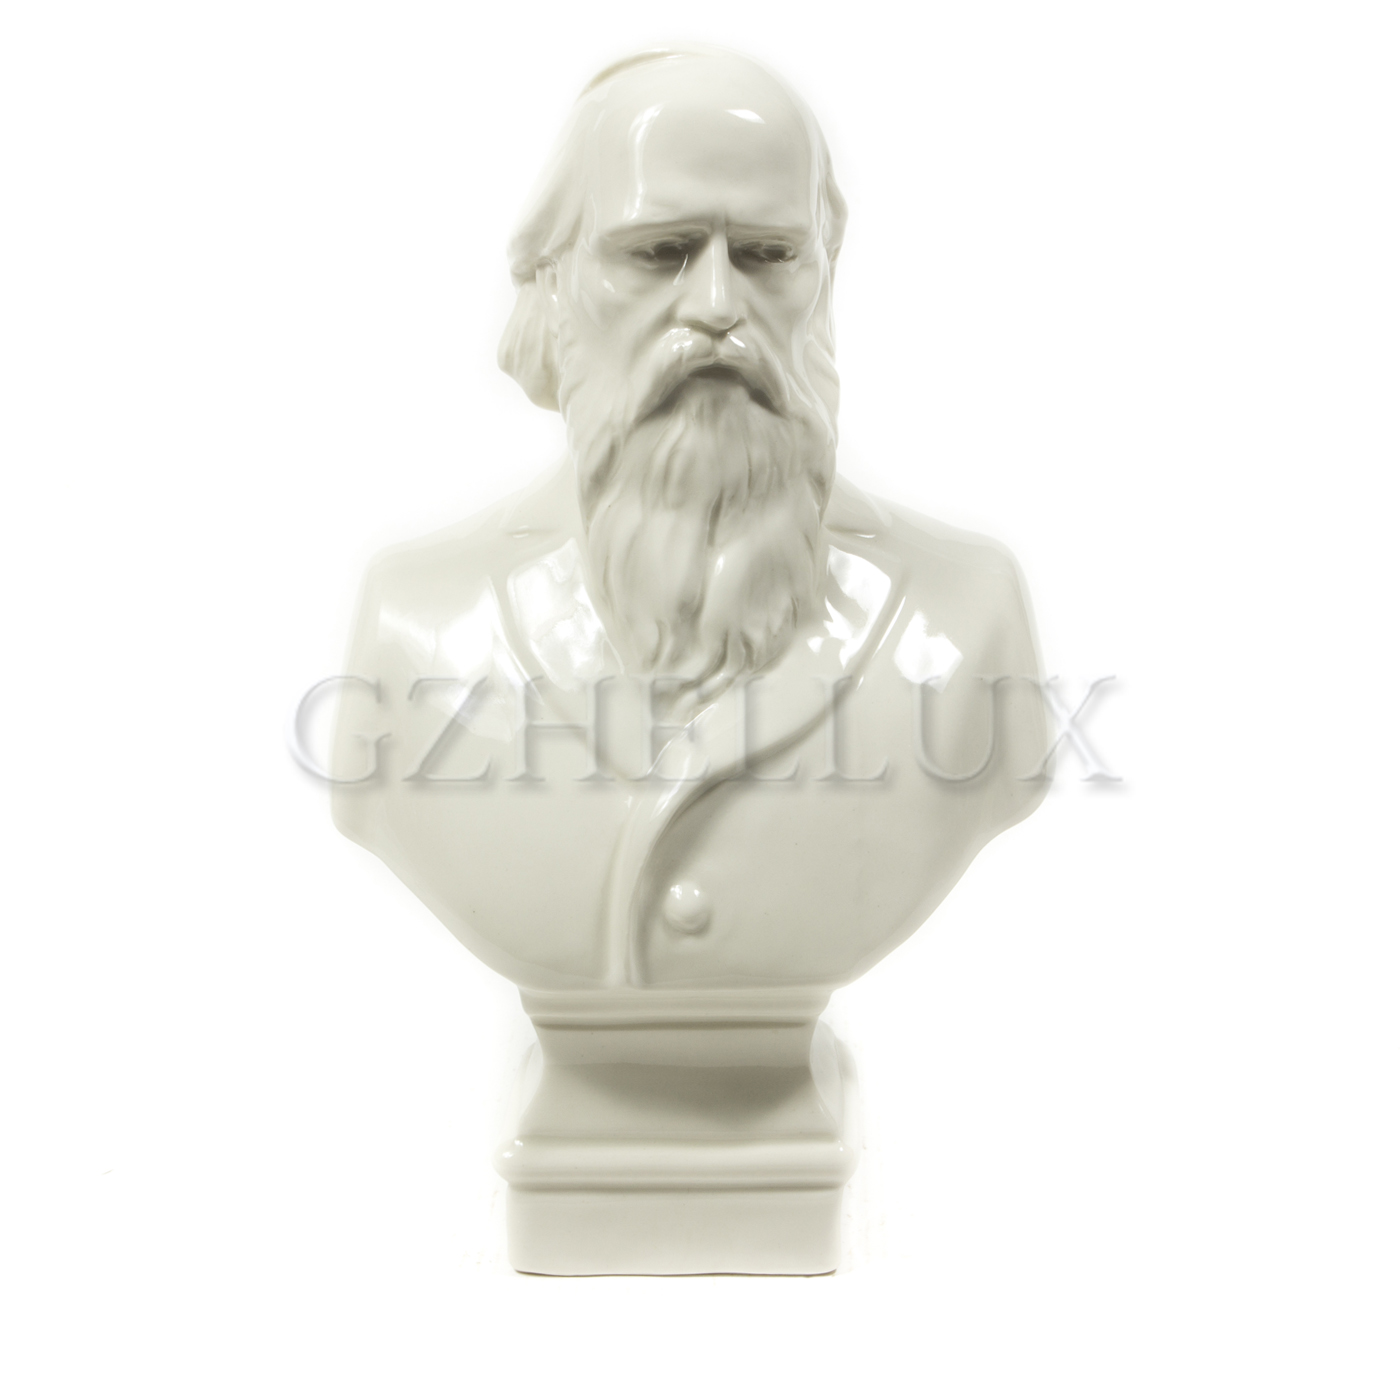 Скульптура Бюст «Салтыков-Щедрин М.Е.»